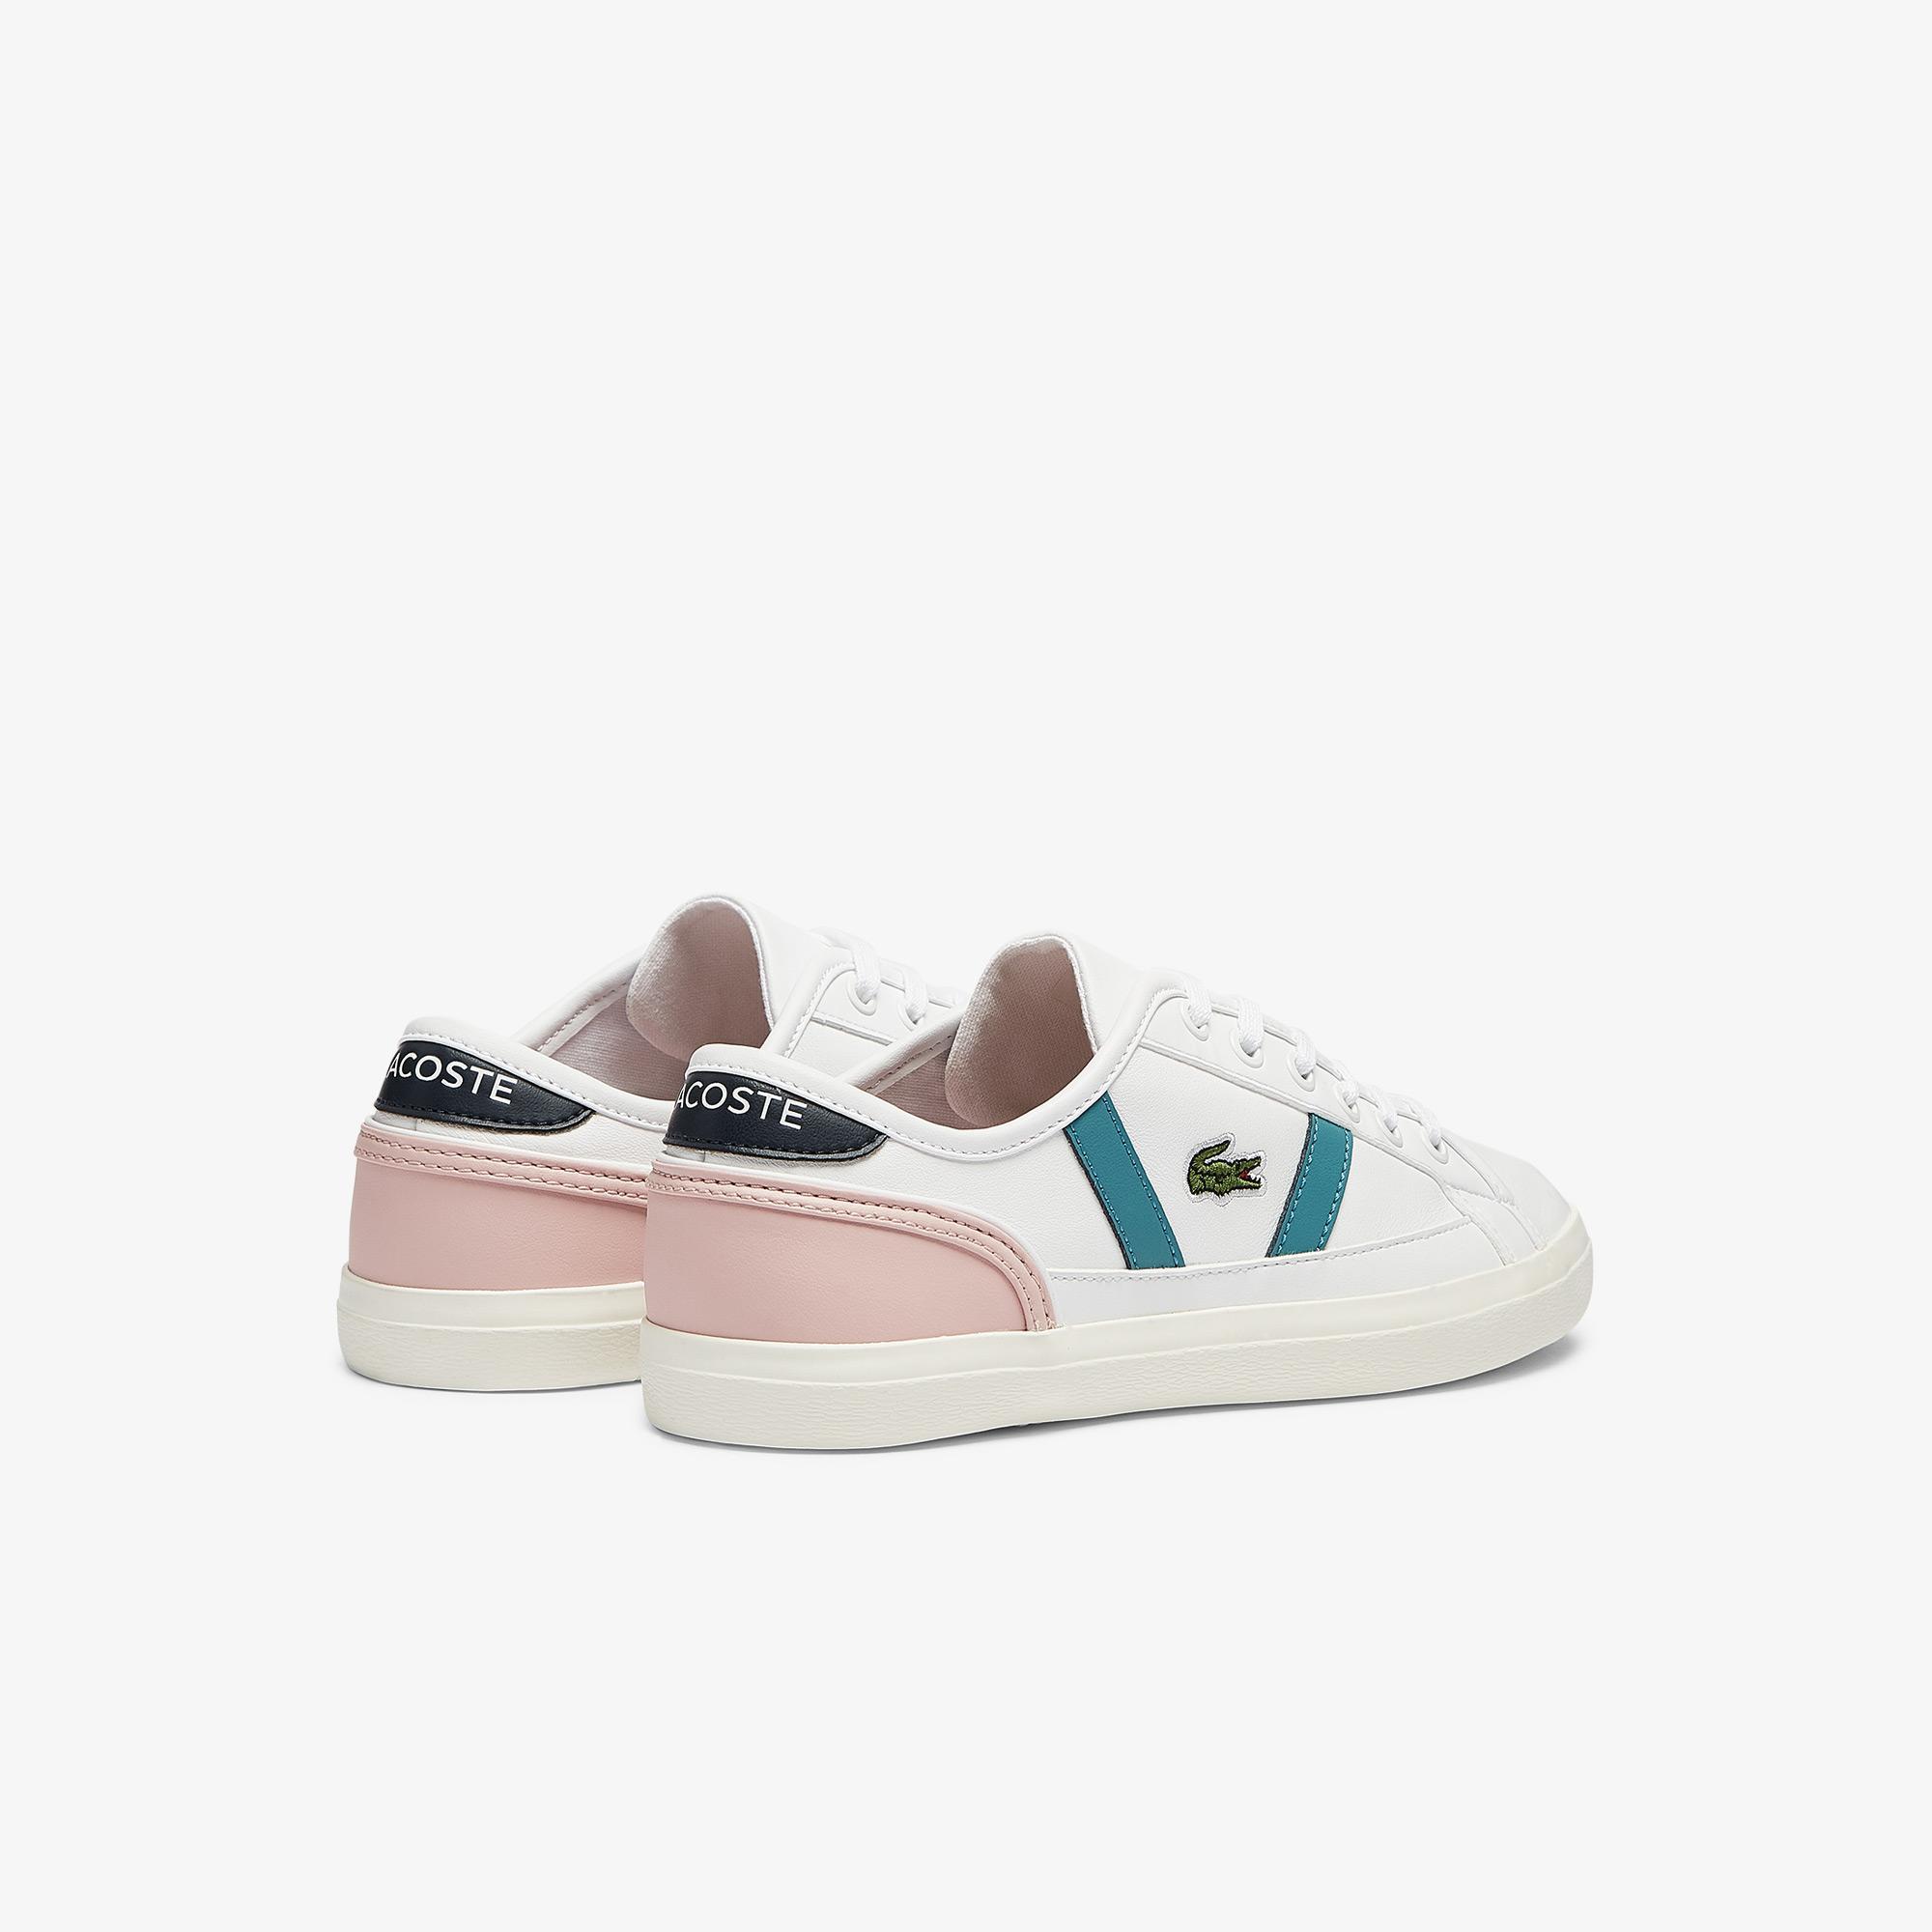 Lacoste Sideline 0721 1 Cfa Kadın Beyaz - Pembe - Mavi Sneaker